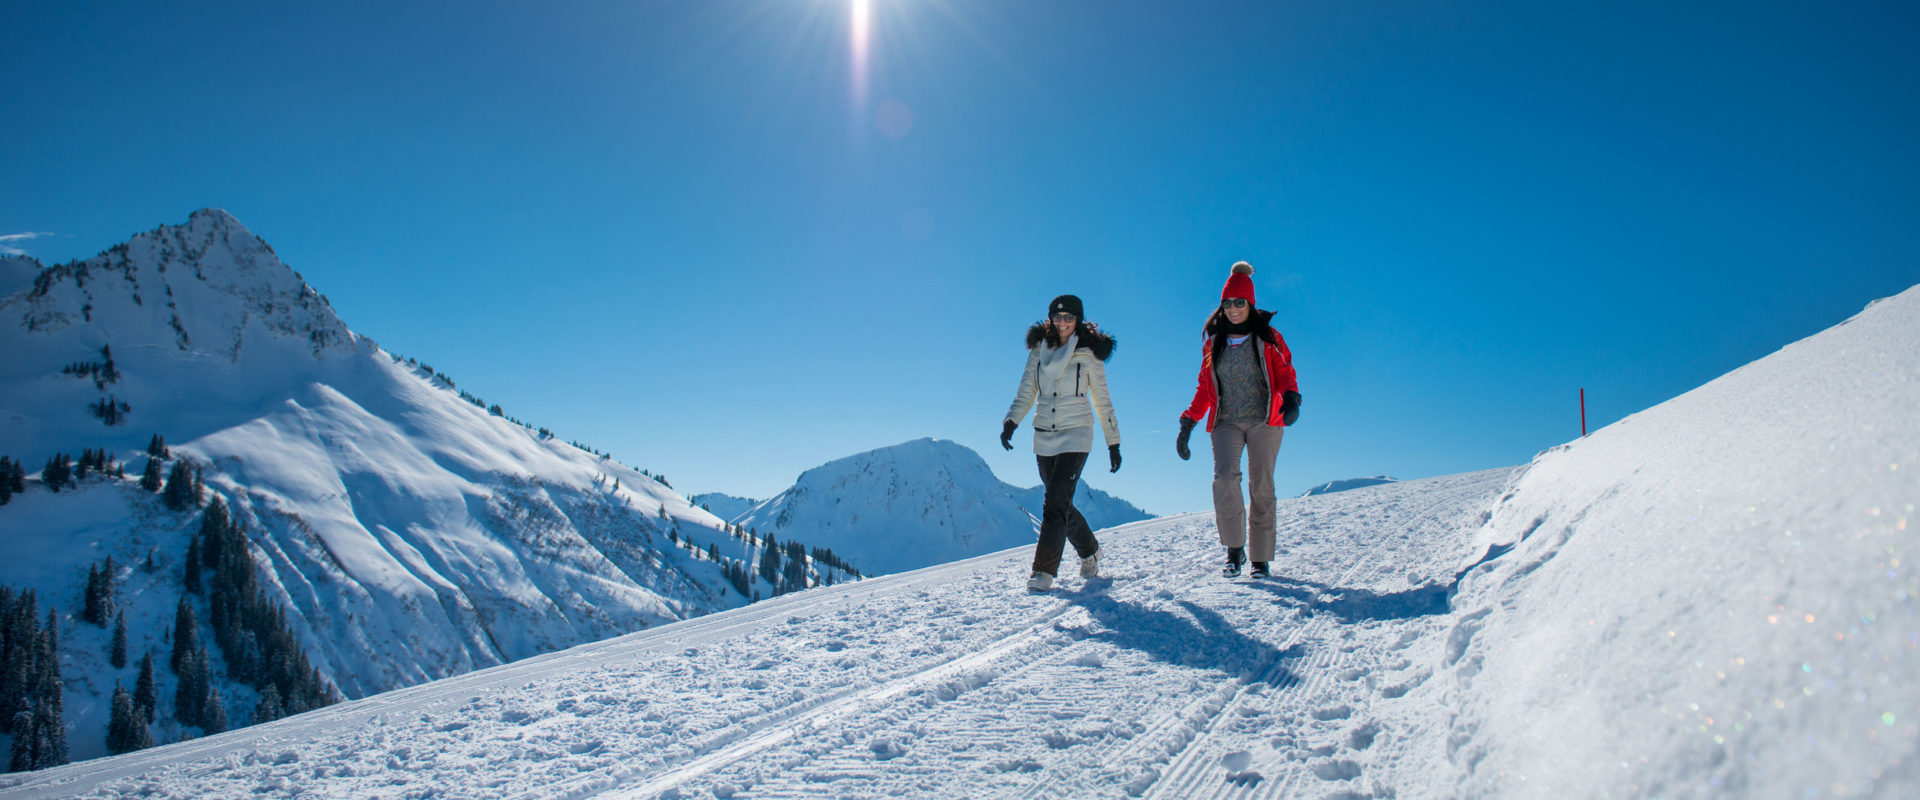 Winter_Damuels © huber-images / Damüls-Faschina Tourismus